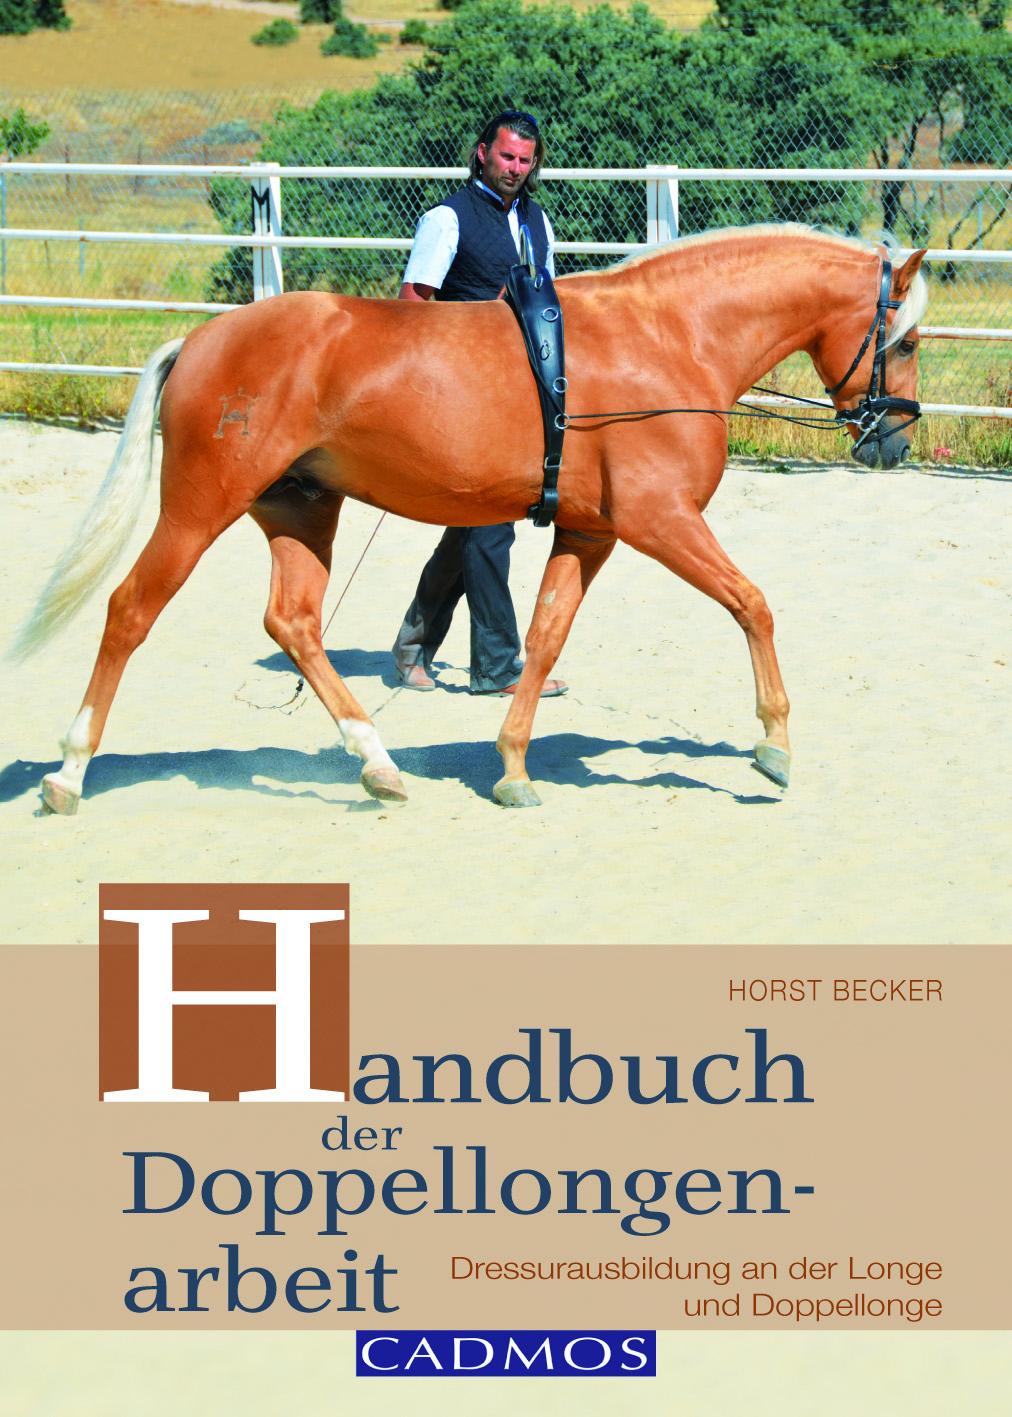 Handbuch der Doppellongen-Arbeit